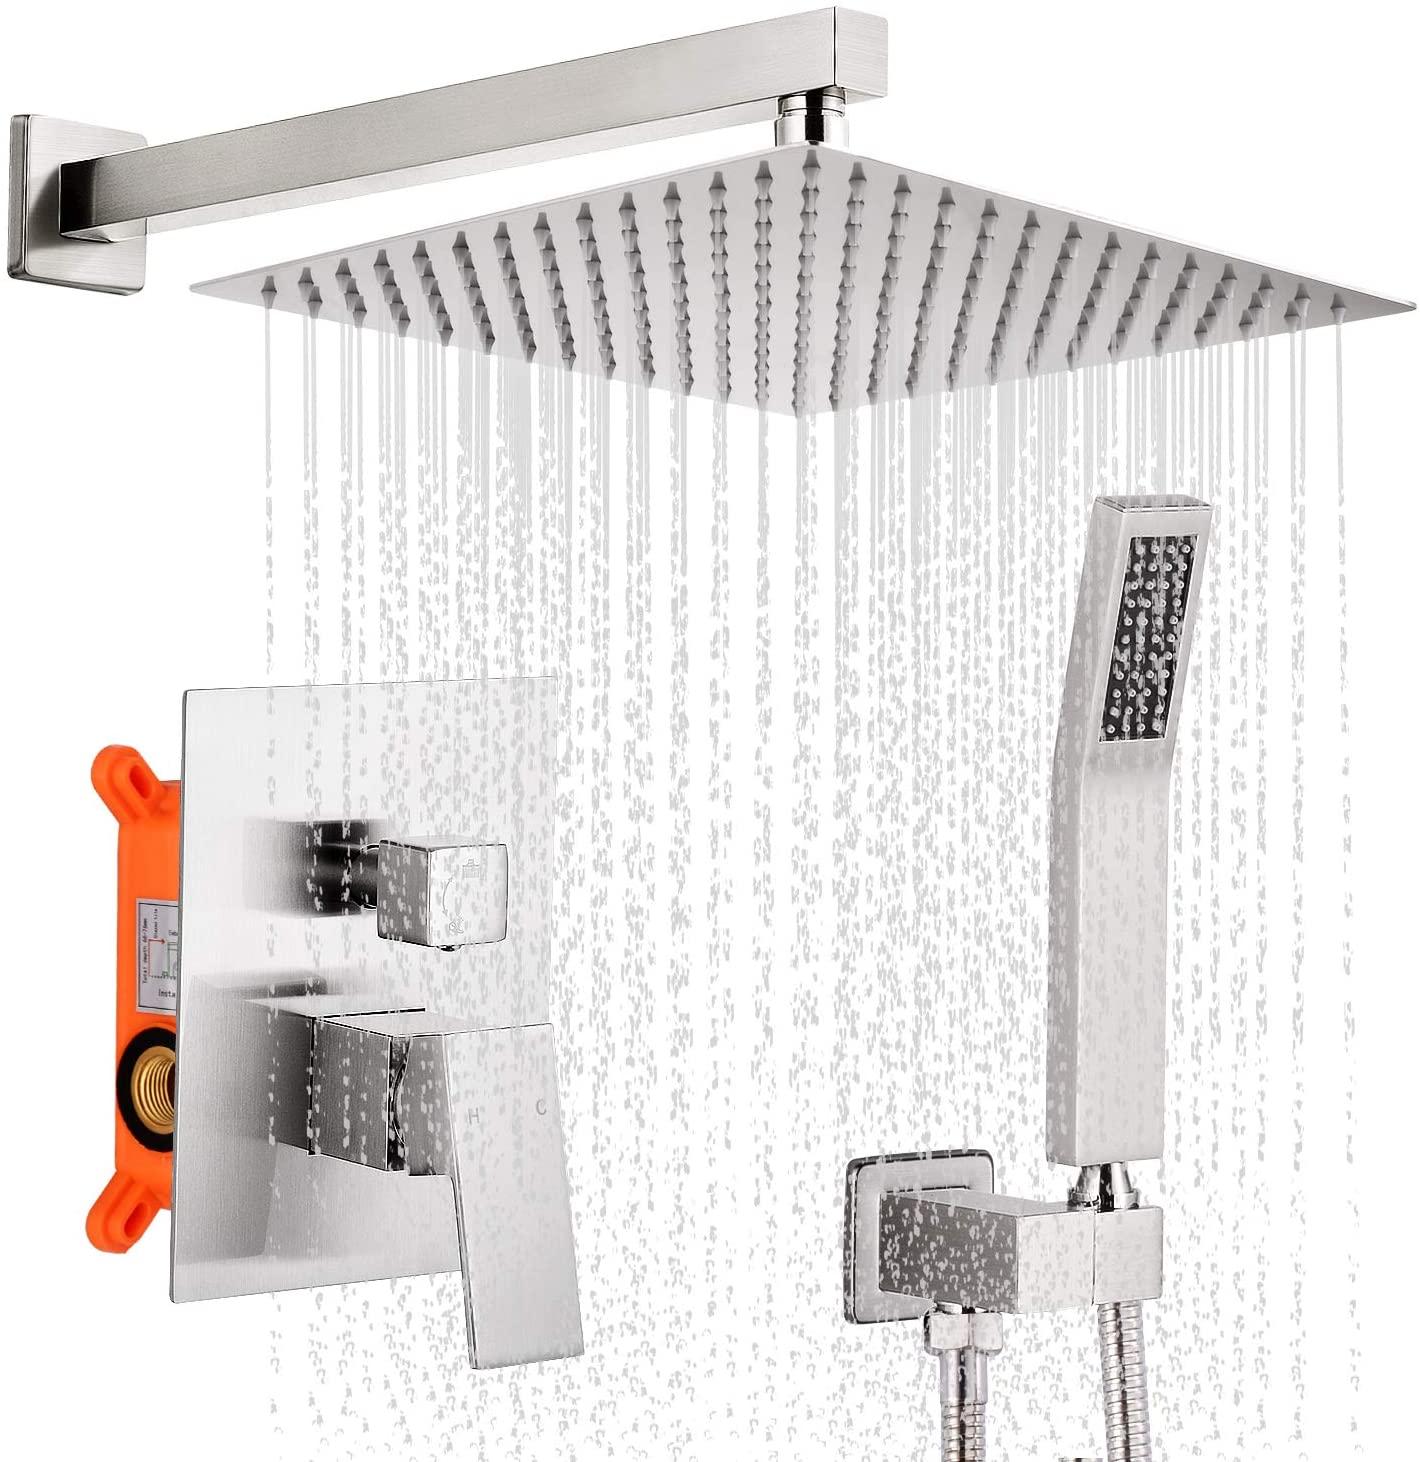 Qomolangma 12 Inch Brushed Nickel Rain Shower